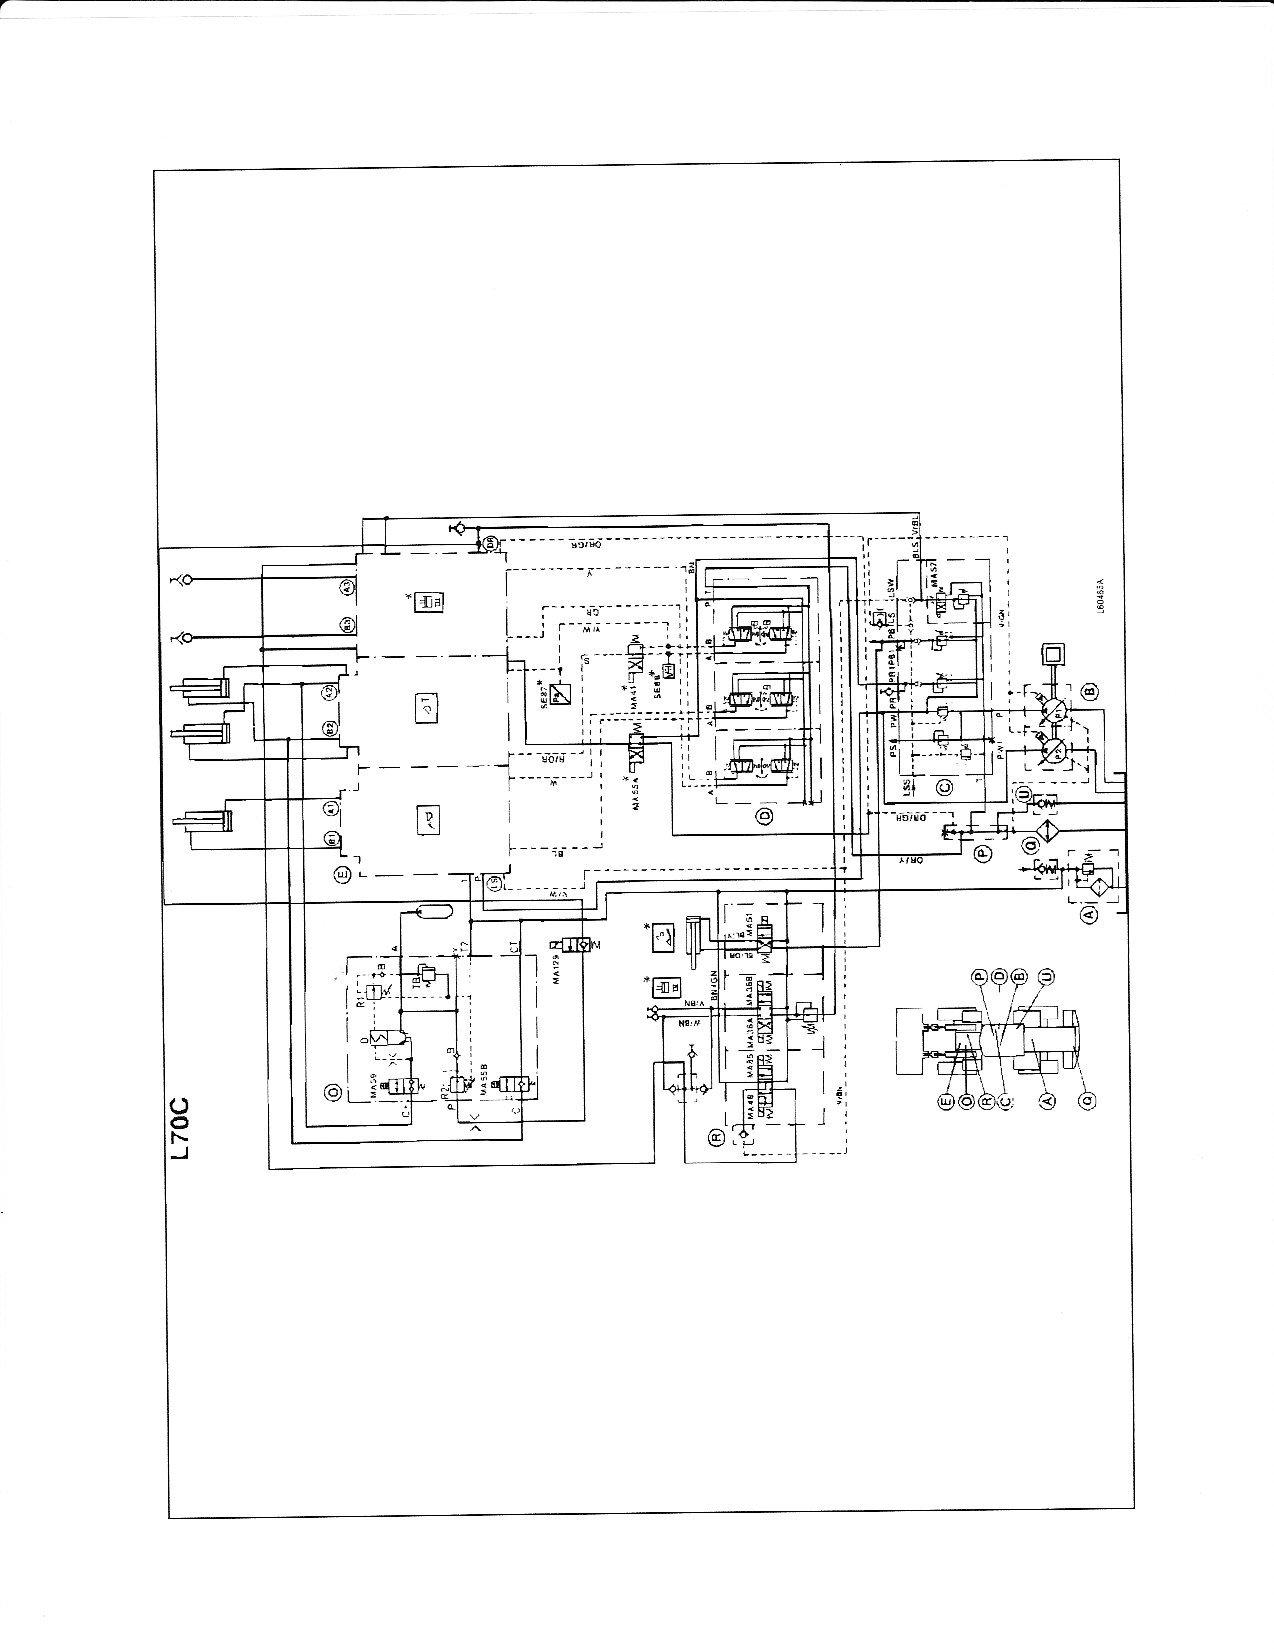 Volvo L20 Loader Wiring Diagram Diagrams L30b Detailed Schematics Forks